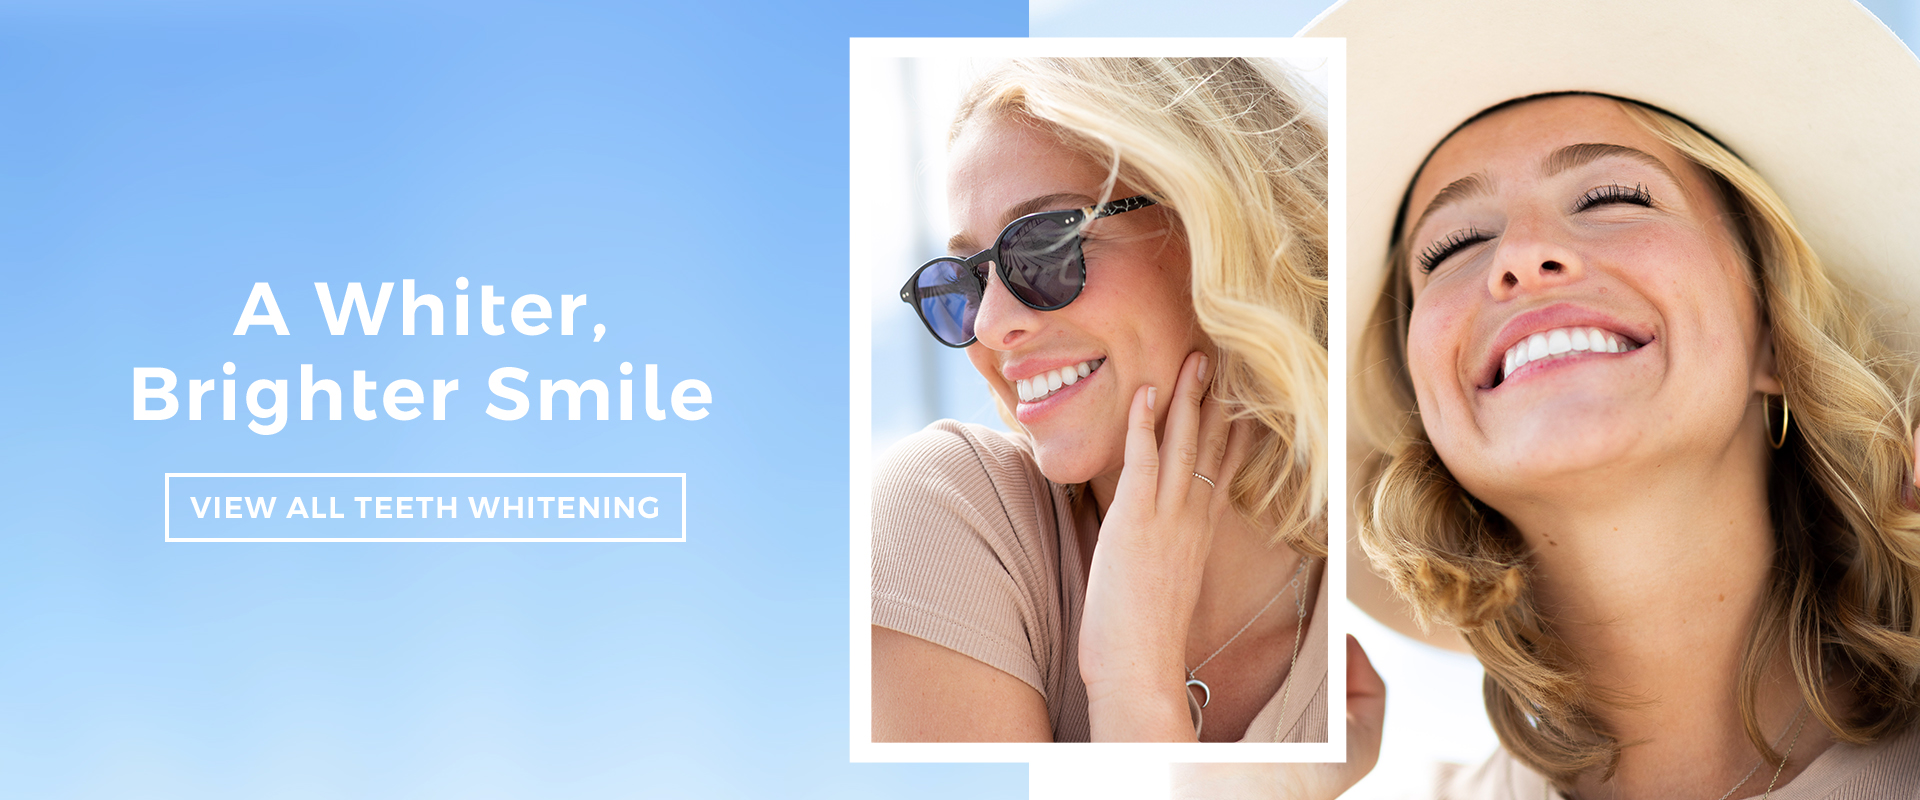 A whiter brighter smile